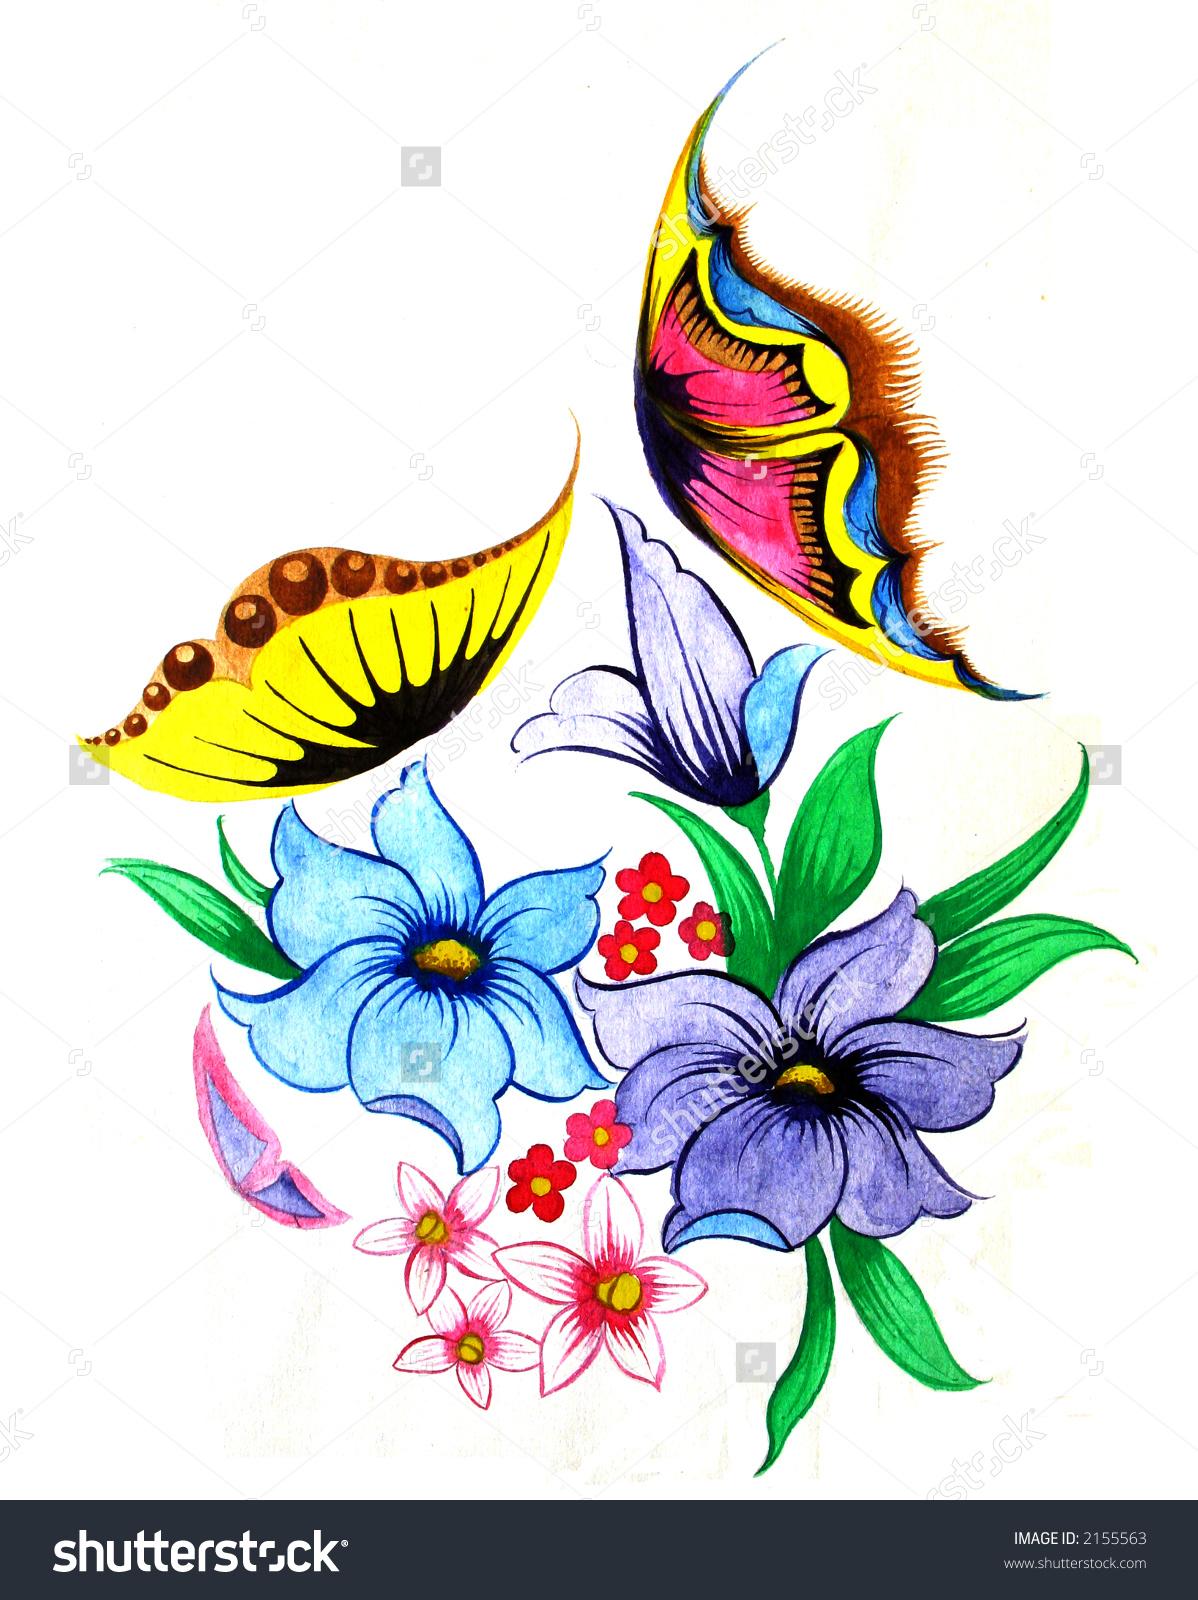 Flowers Butterflies Scan Original Drawing Stock Photo 2155563.